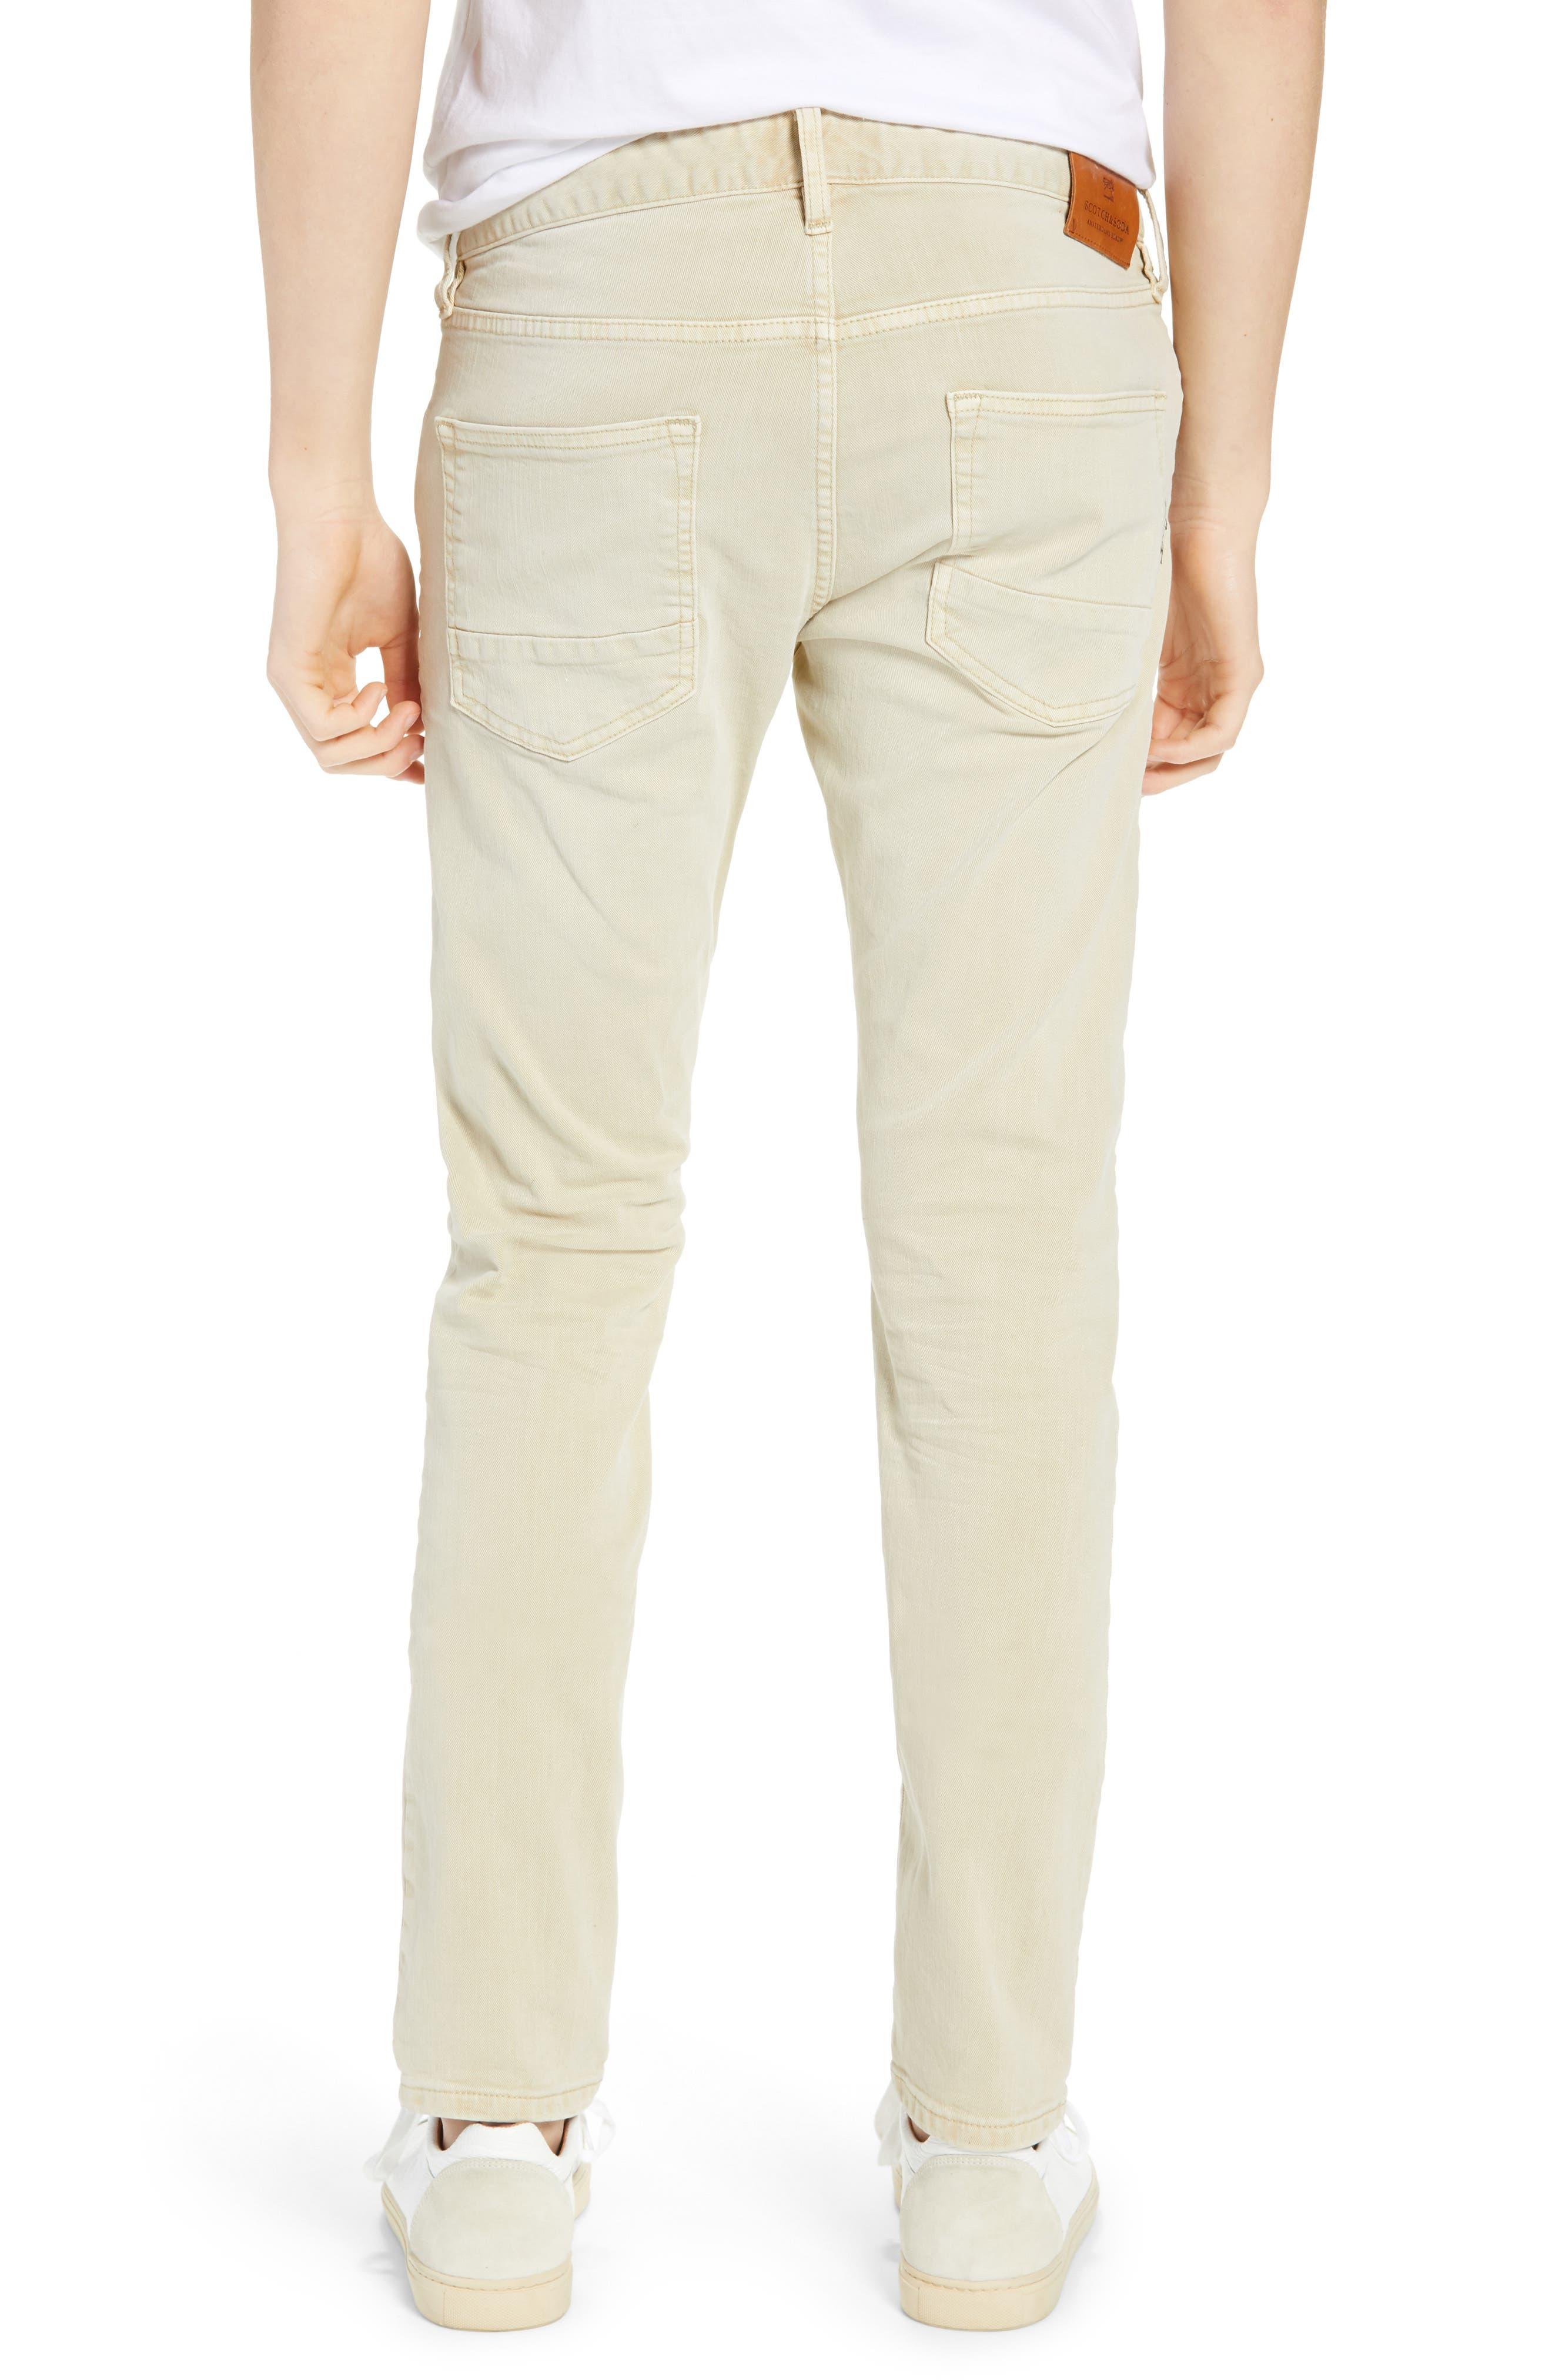 Ralston Slim Fit Pants,                             Alternate thumbnail 2, color,                             SAND